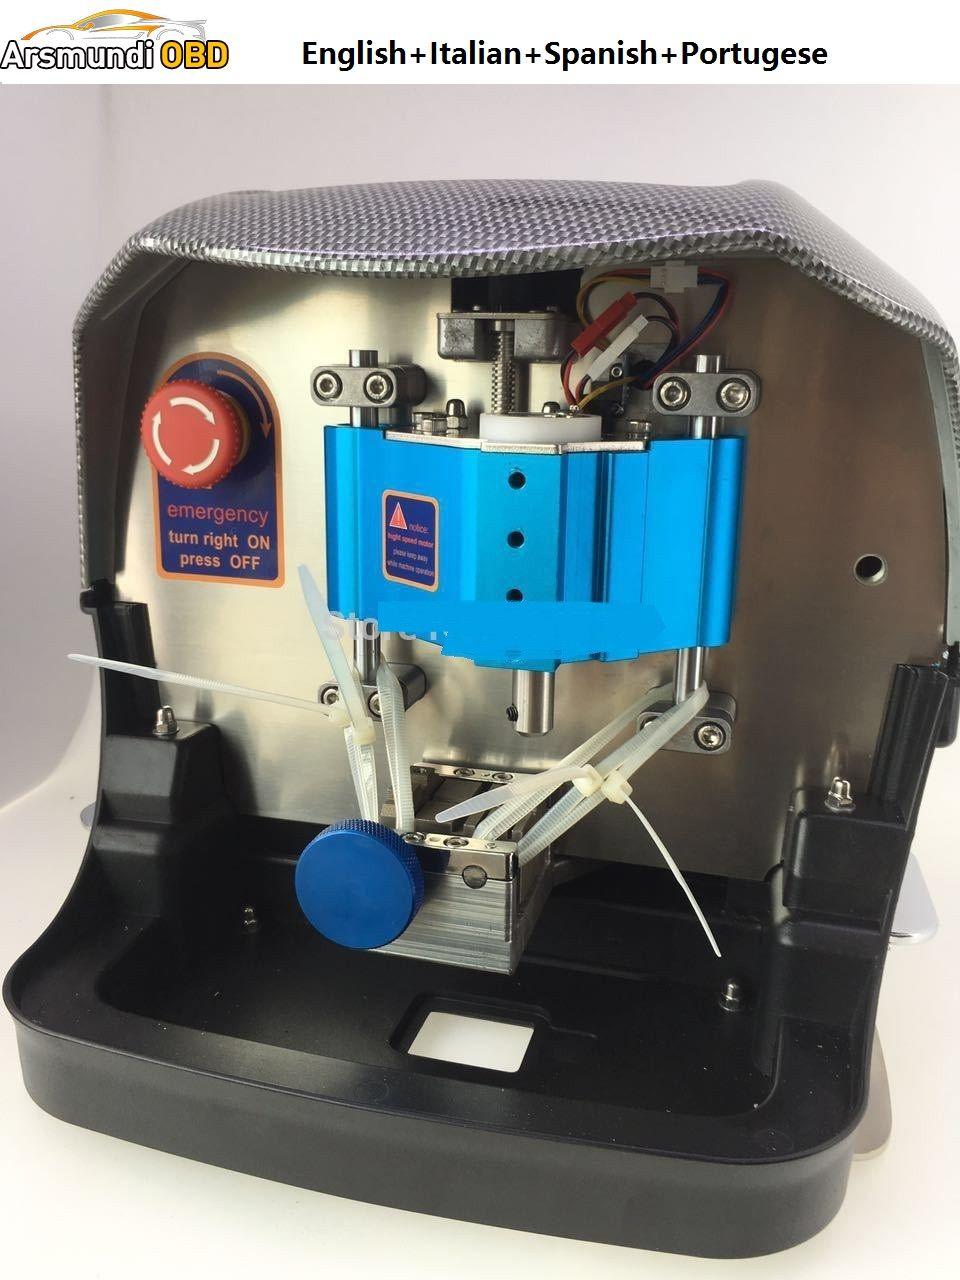 Factory price Automatic KCM Auto key cutting machine updated from V8X6 key  cutting machine Better than Slica Key Machine